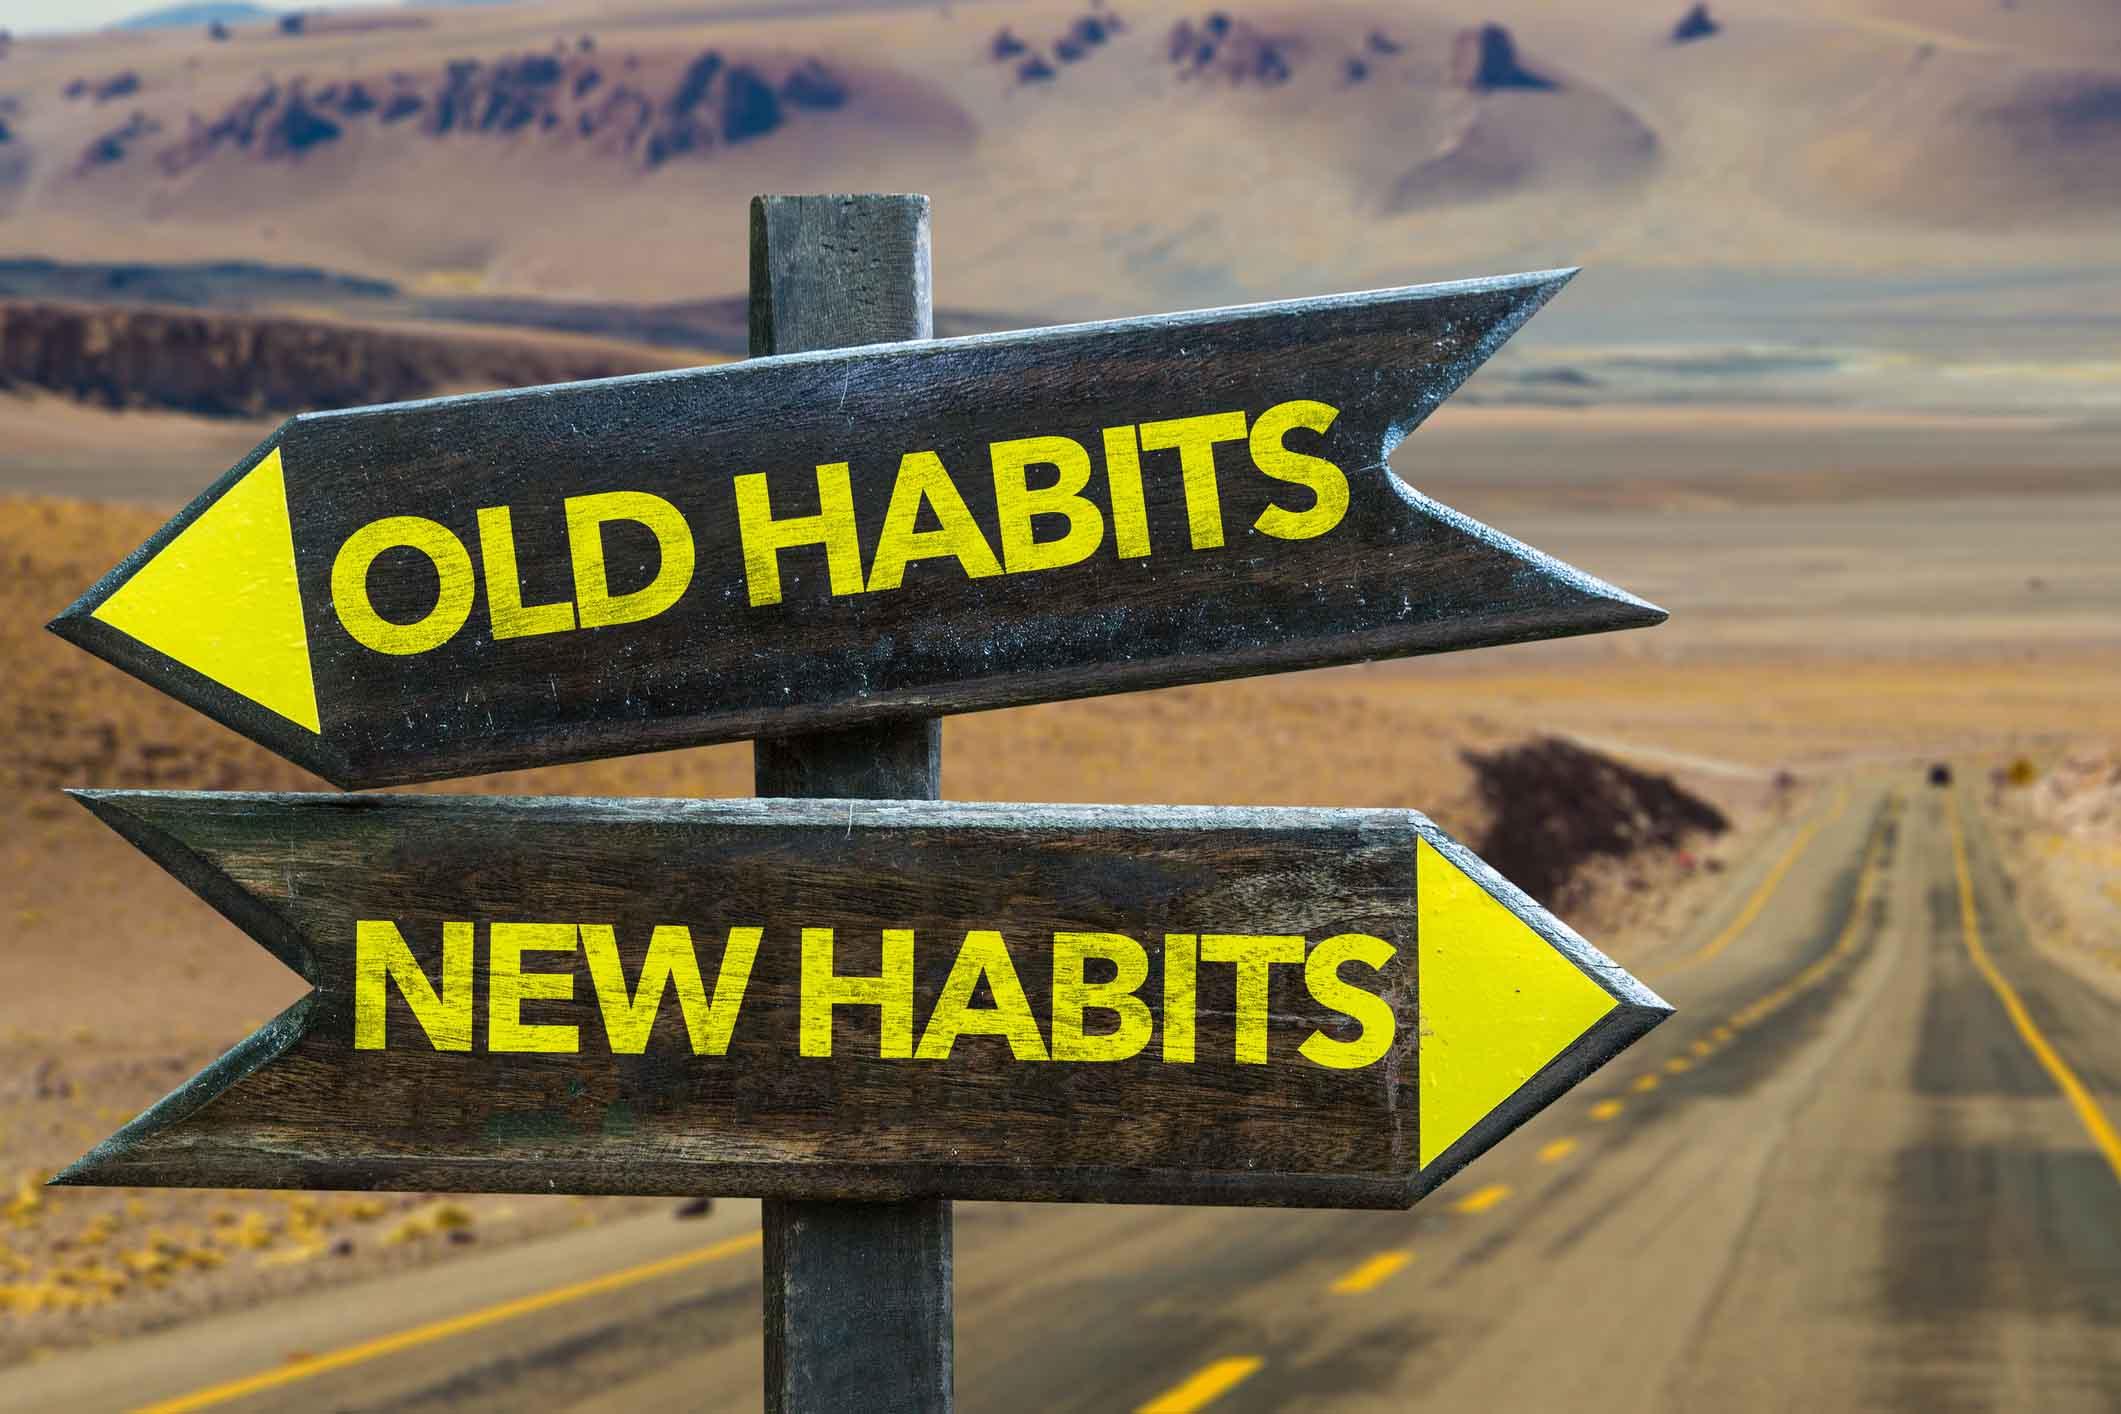 Old Habits New Habits signpost